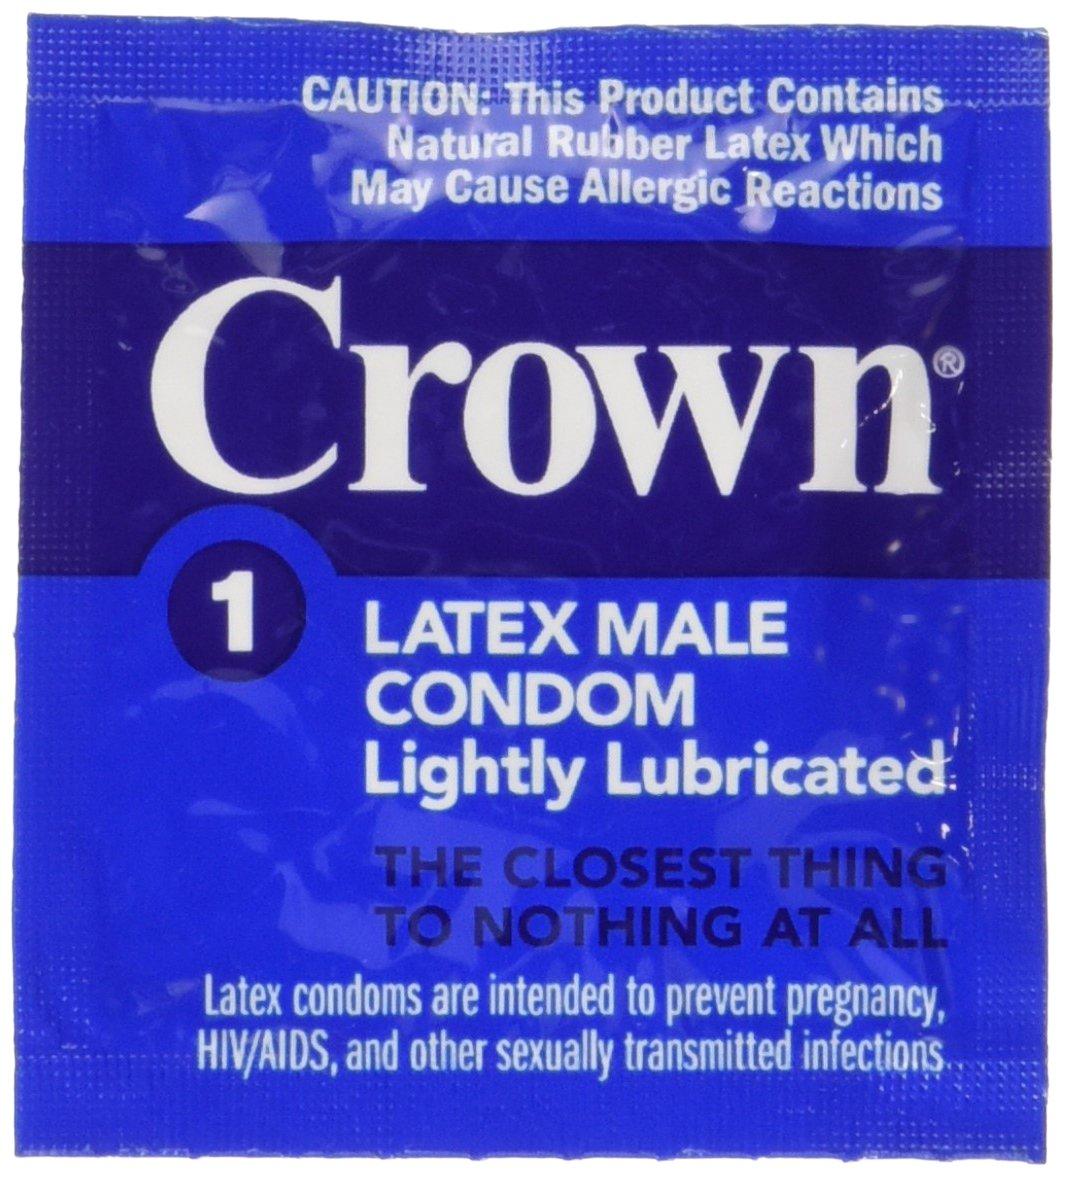 Create Amazon Ca Account - 24 okamoto crown condoms world famous super thin and sensitive condom for extra sensation